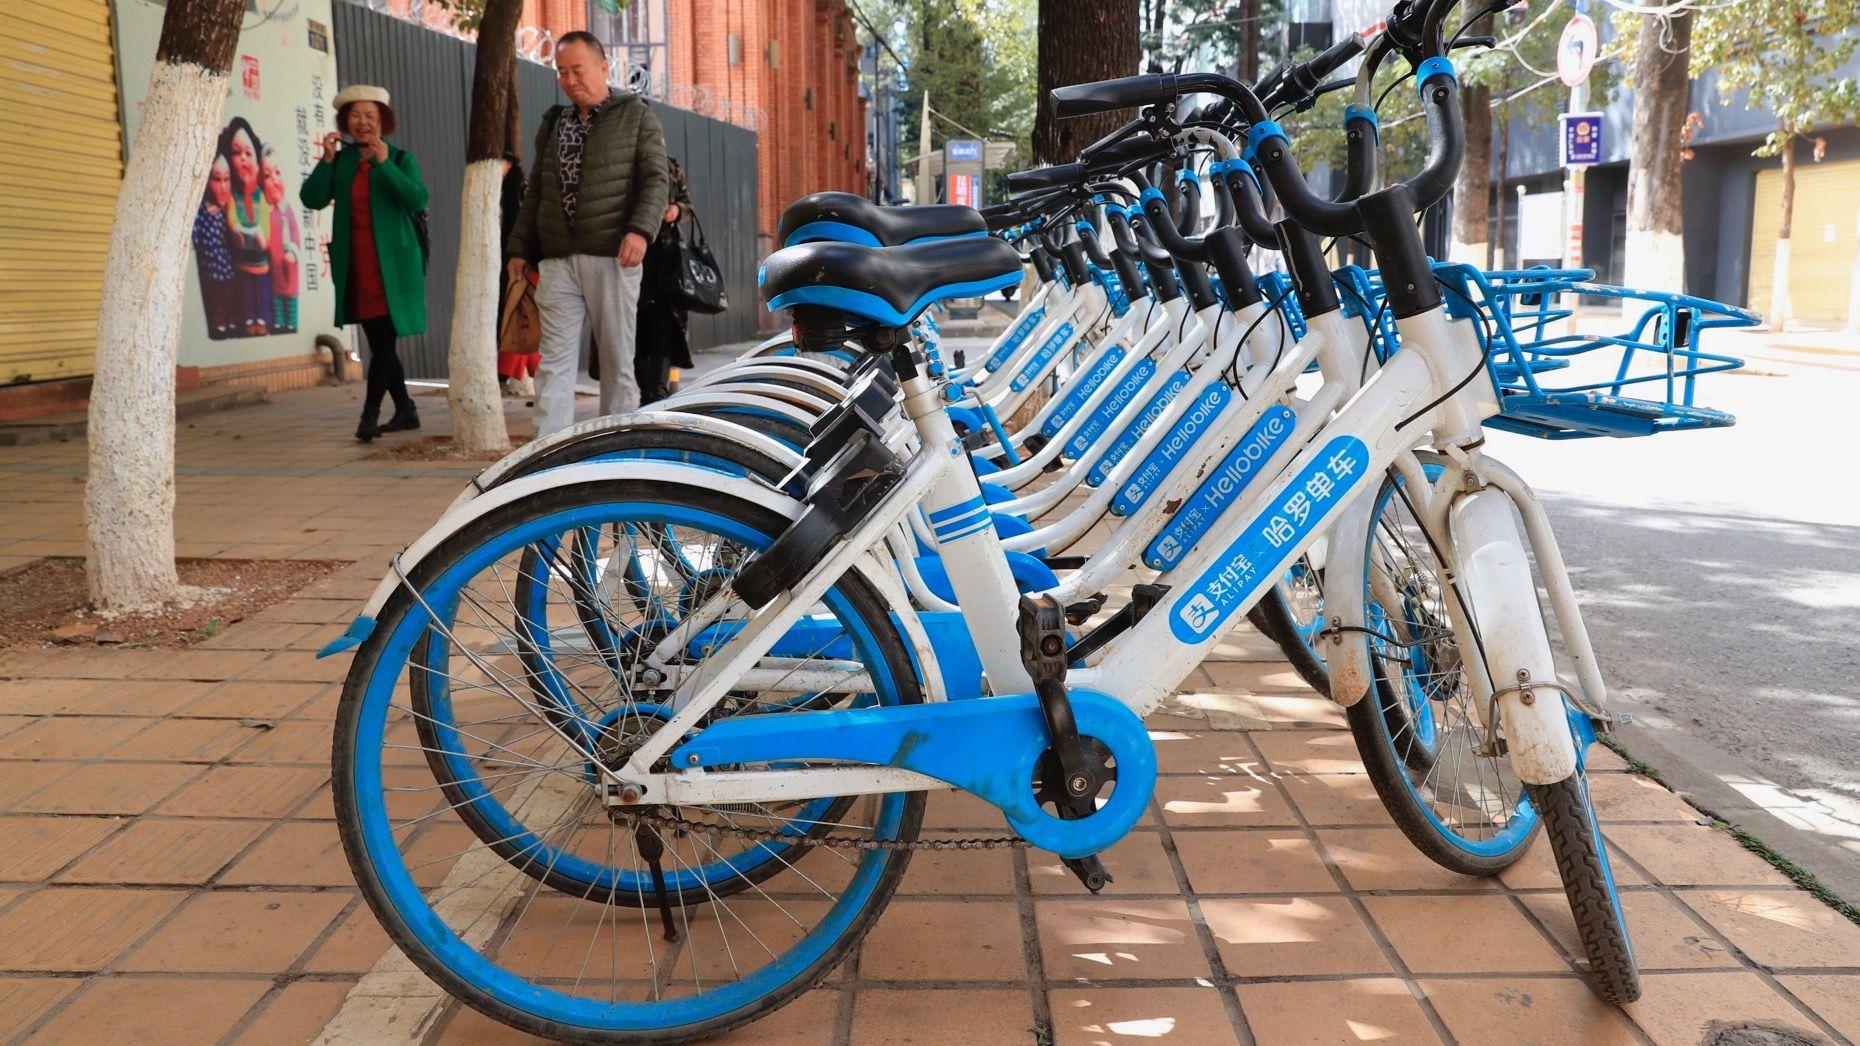 Hellobike bikes parked on a sidewalk in Shanghai. Photo: AP